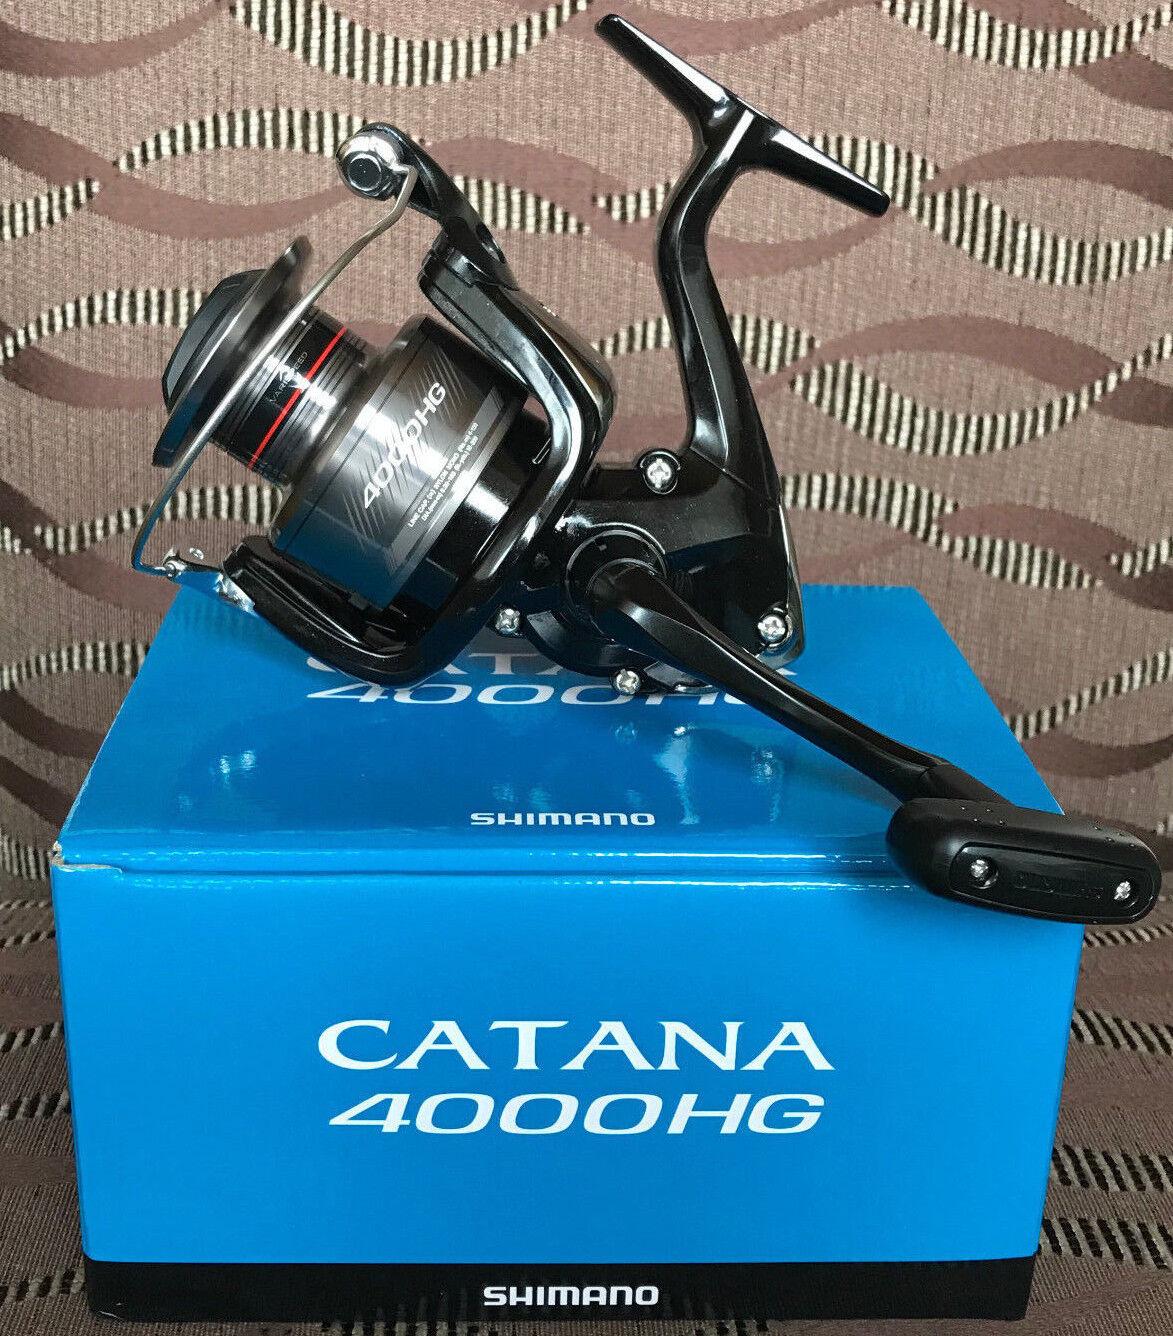 Shimano Catana 4000HG FD Spinnrolle